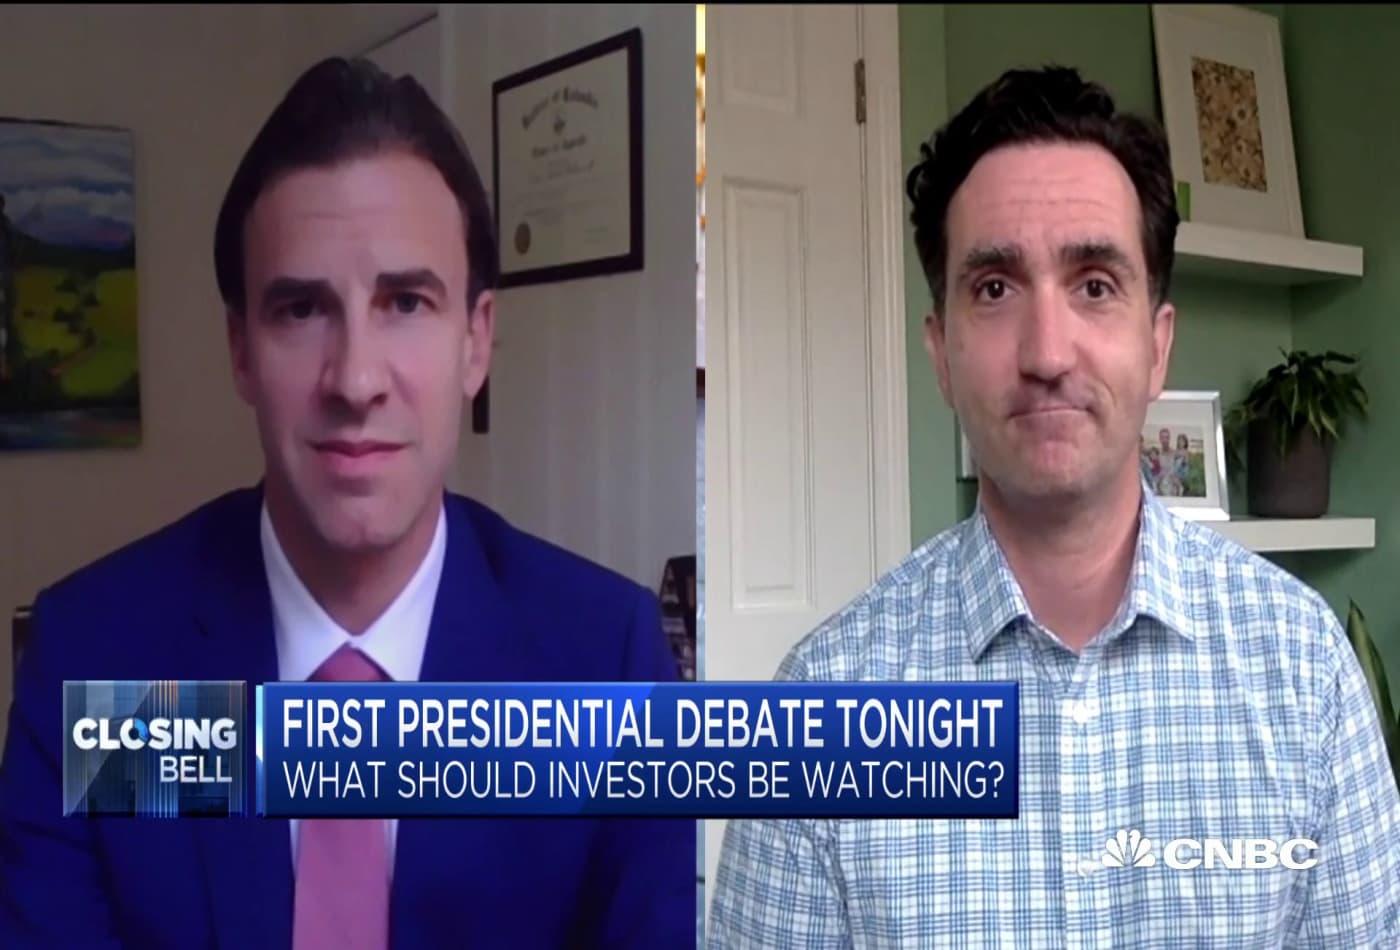 How investors are watching tonight's presidential debate